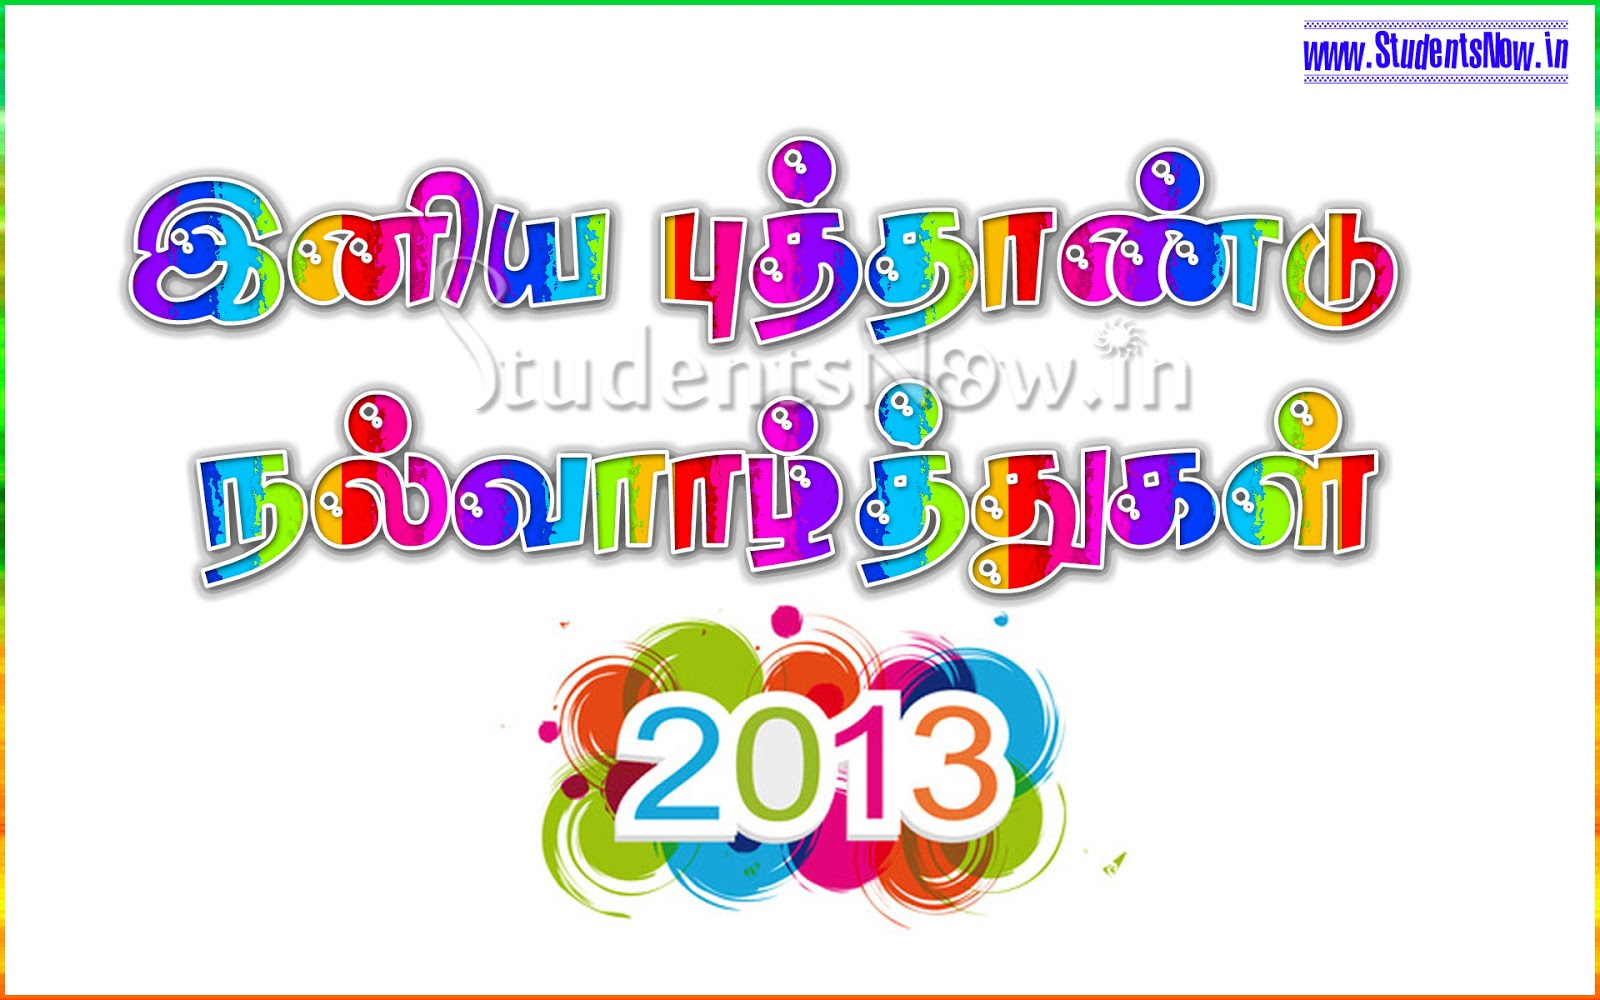 New Year Greetings 2013